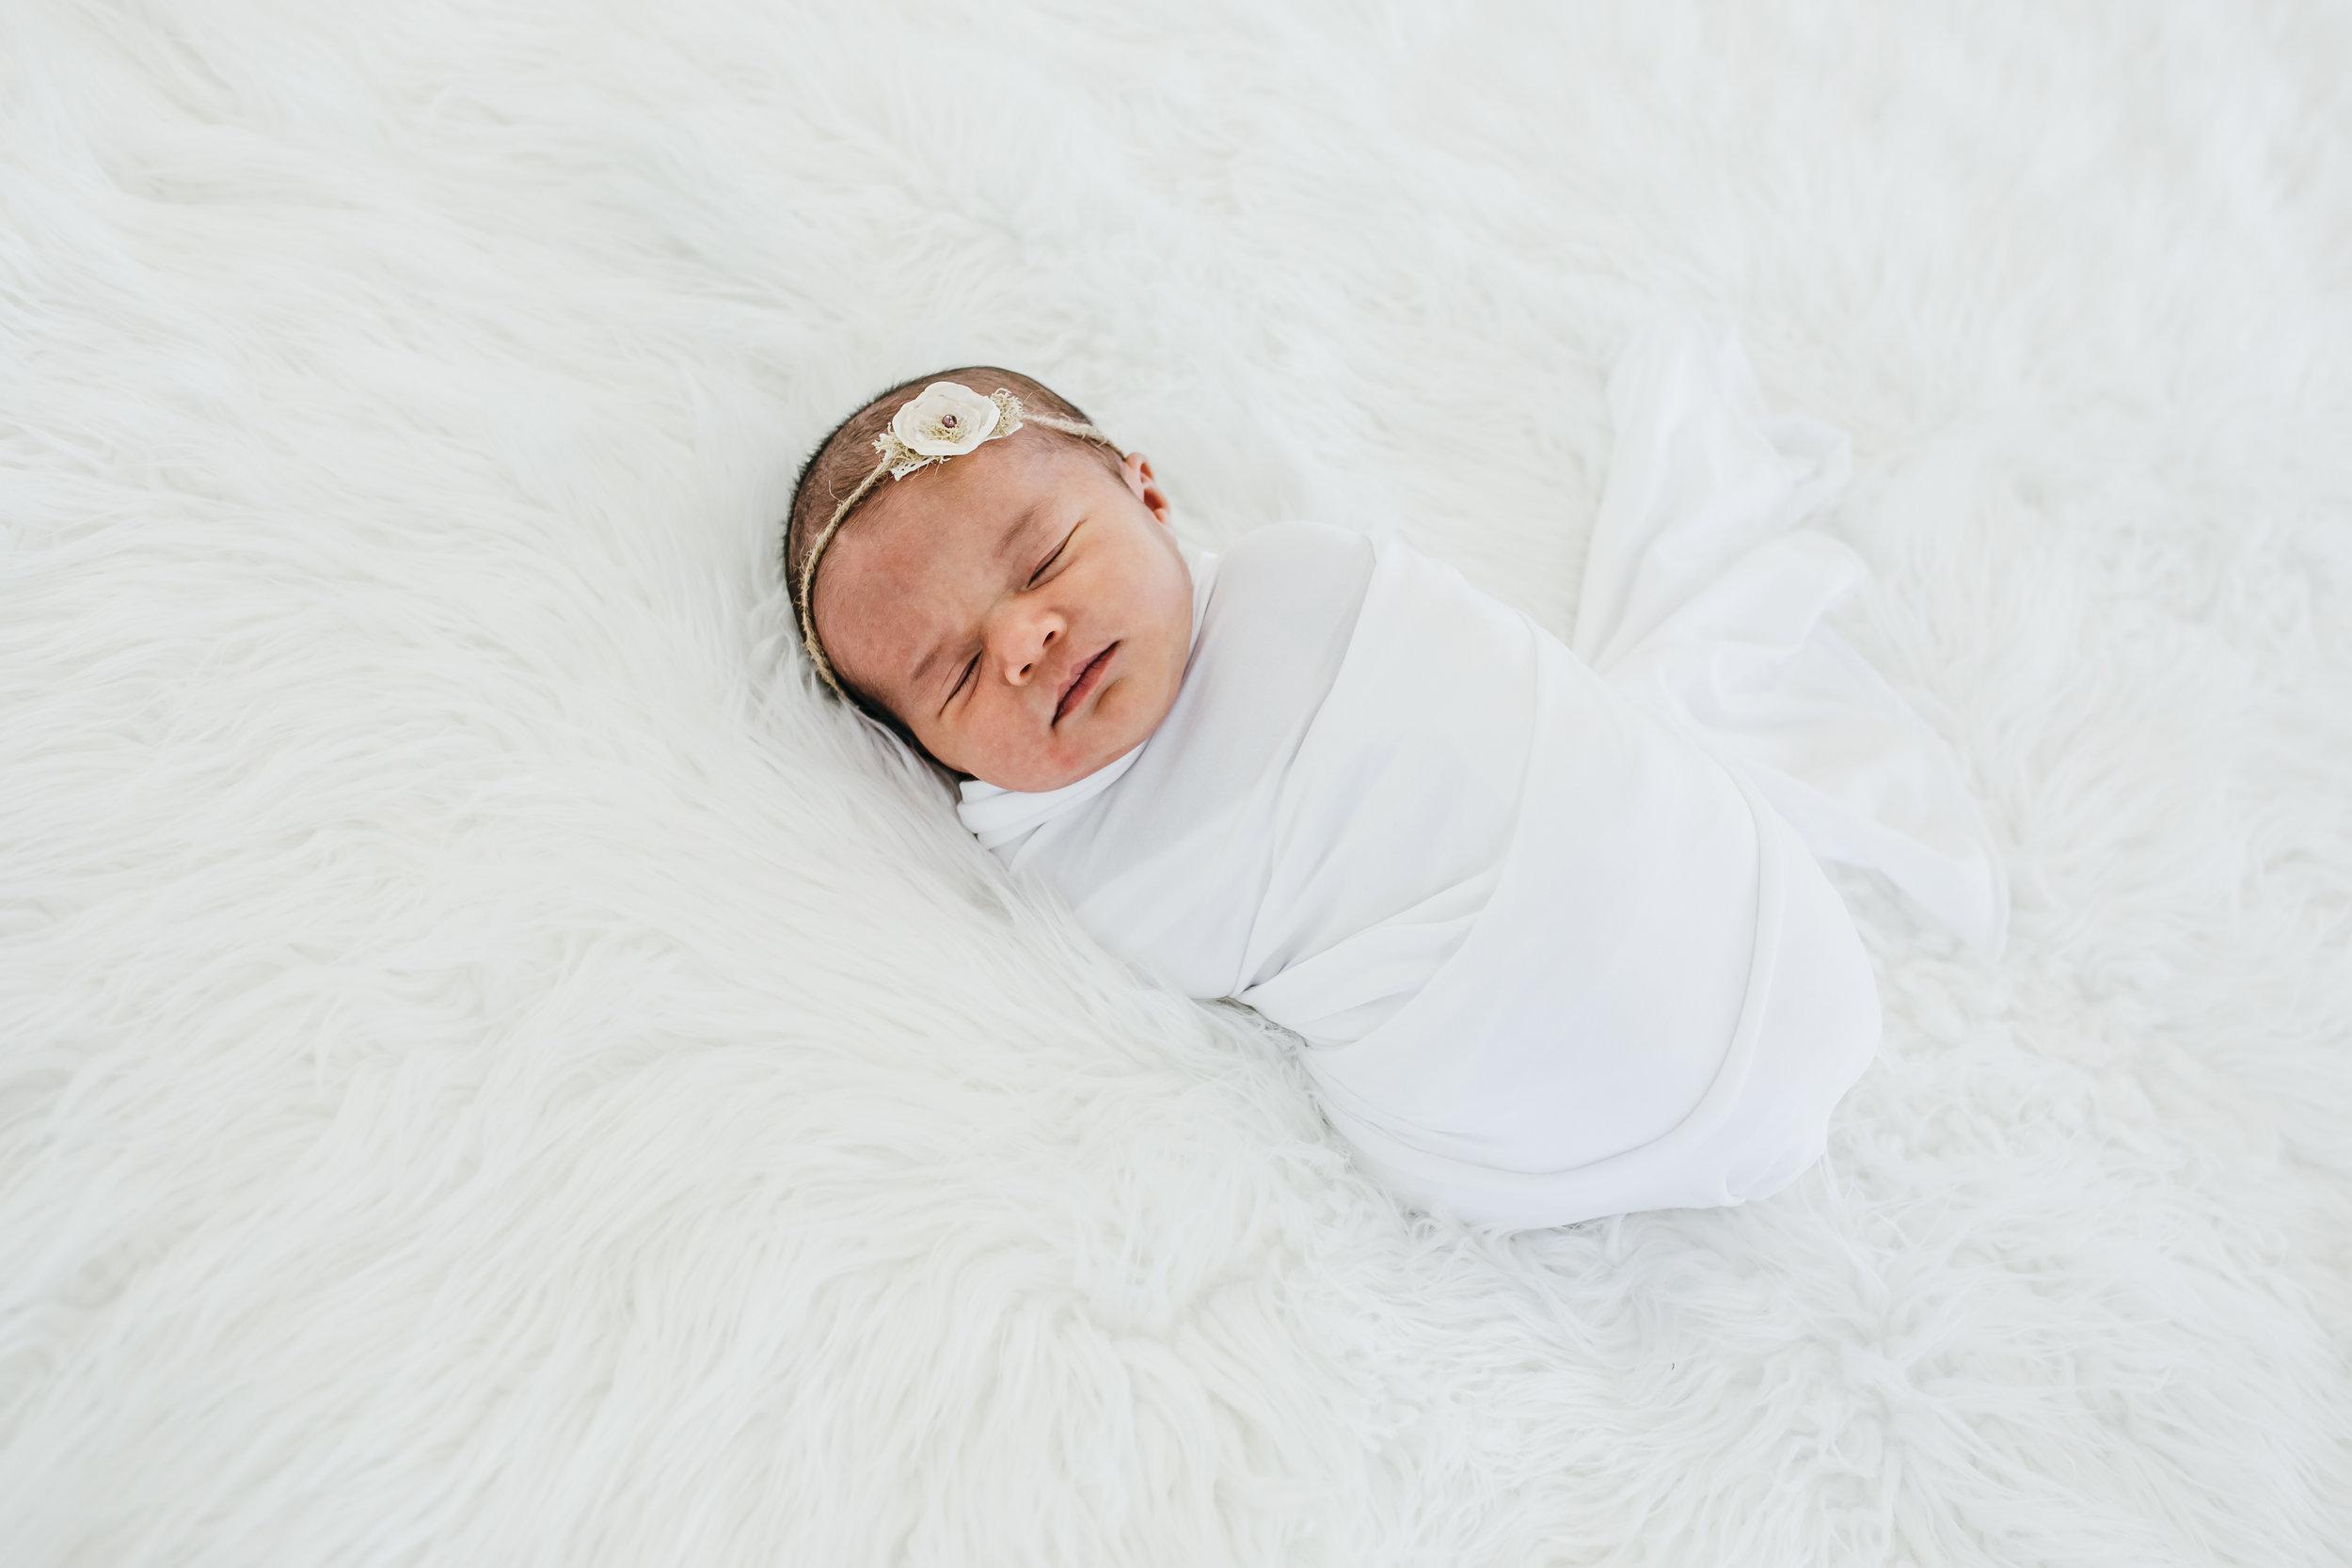 Paklani Baby Girl-8448.jpg